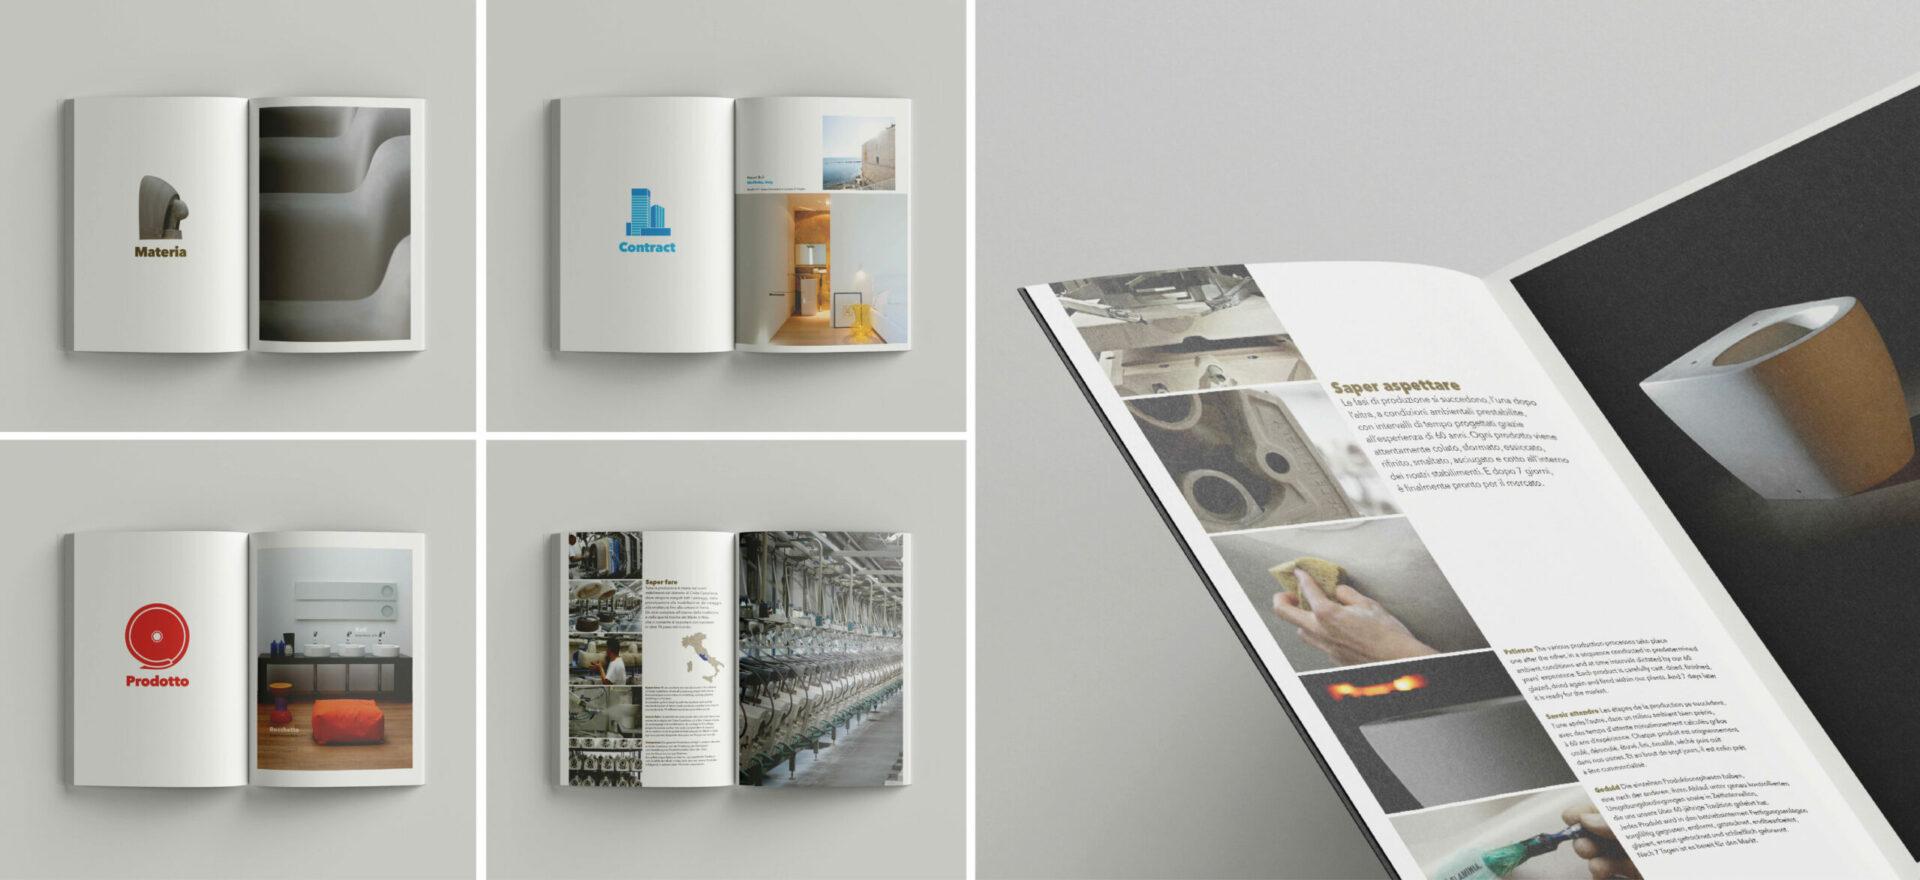 Company Profile | Graphic Design | Catalogues | Ceramica Flaminia | Mario Trimarchi Design | Fragile